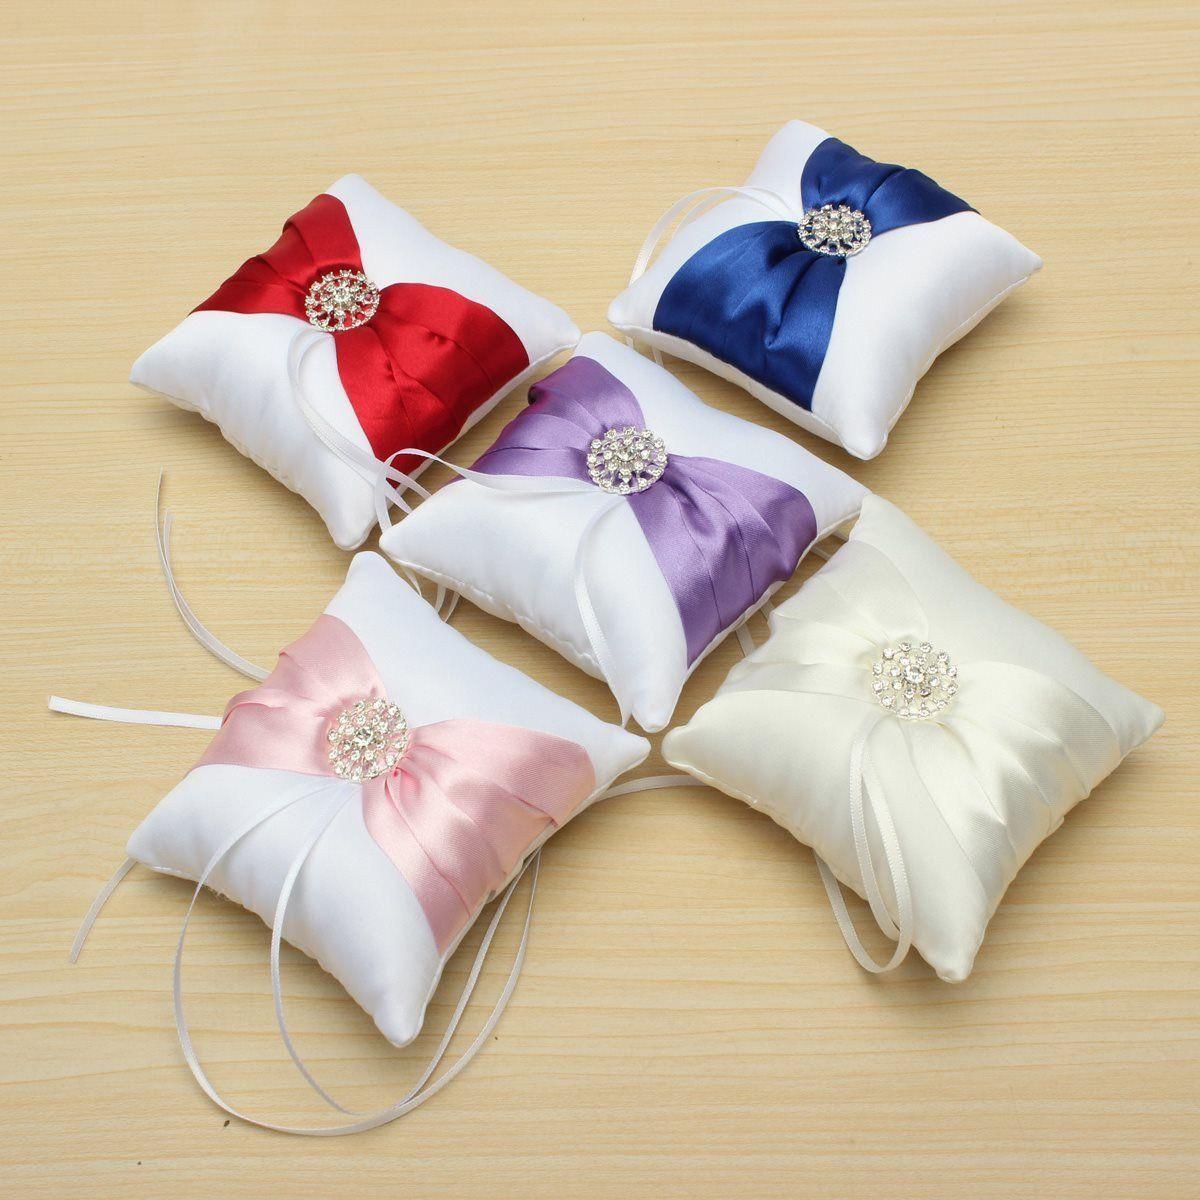 Satin And Crystals Wedding Ring Pillow